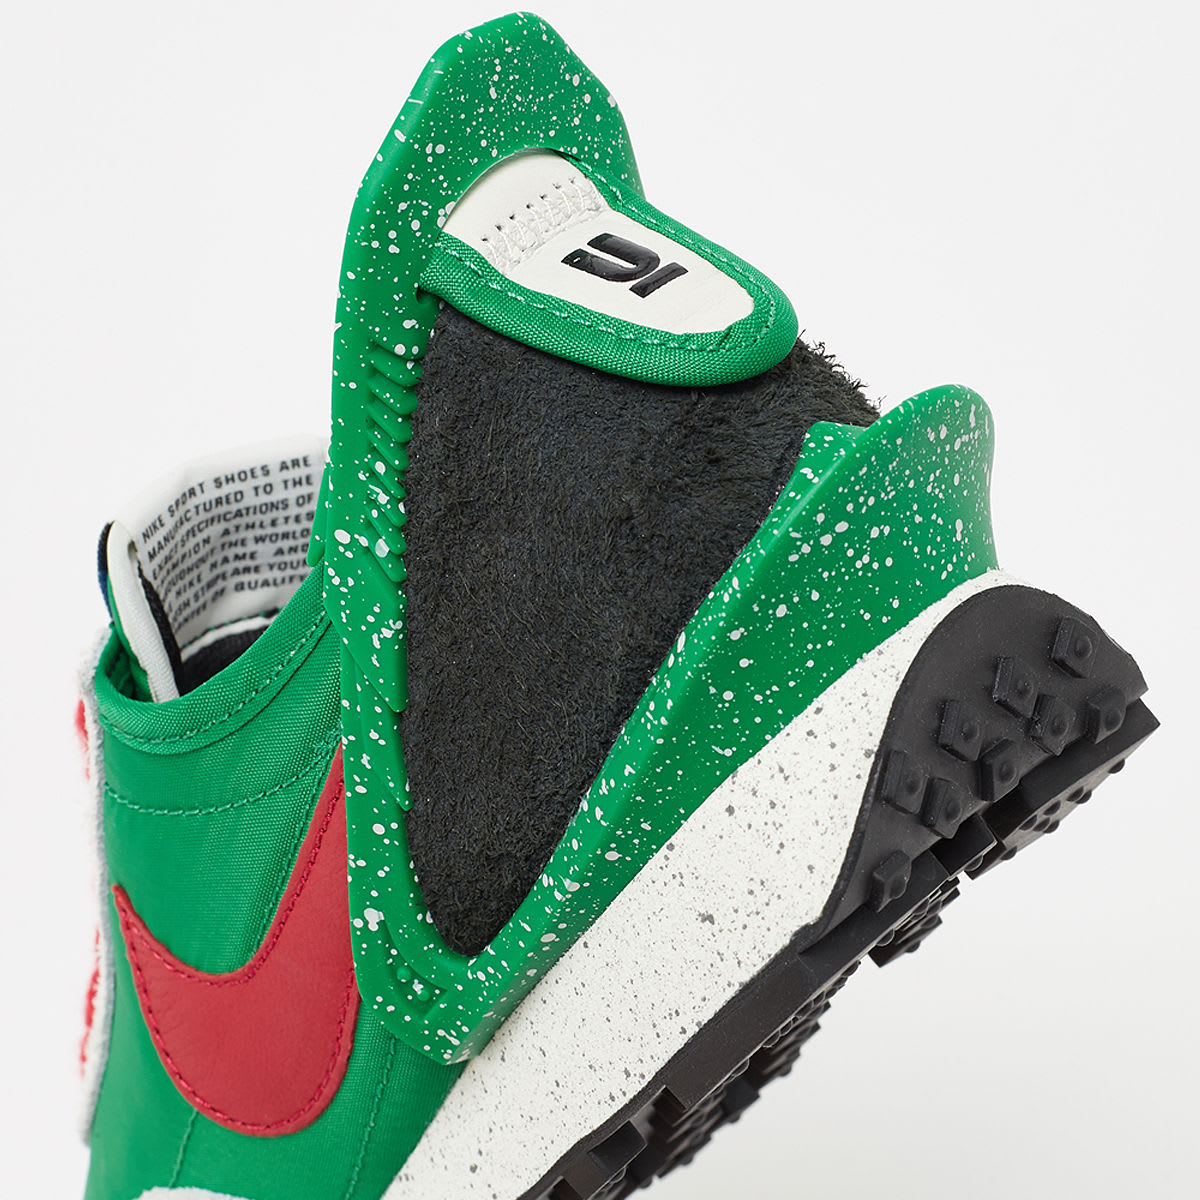 Undercover x Nike Daybreak 'Lucky Green' CJ3295-300 Heel